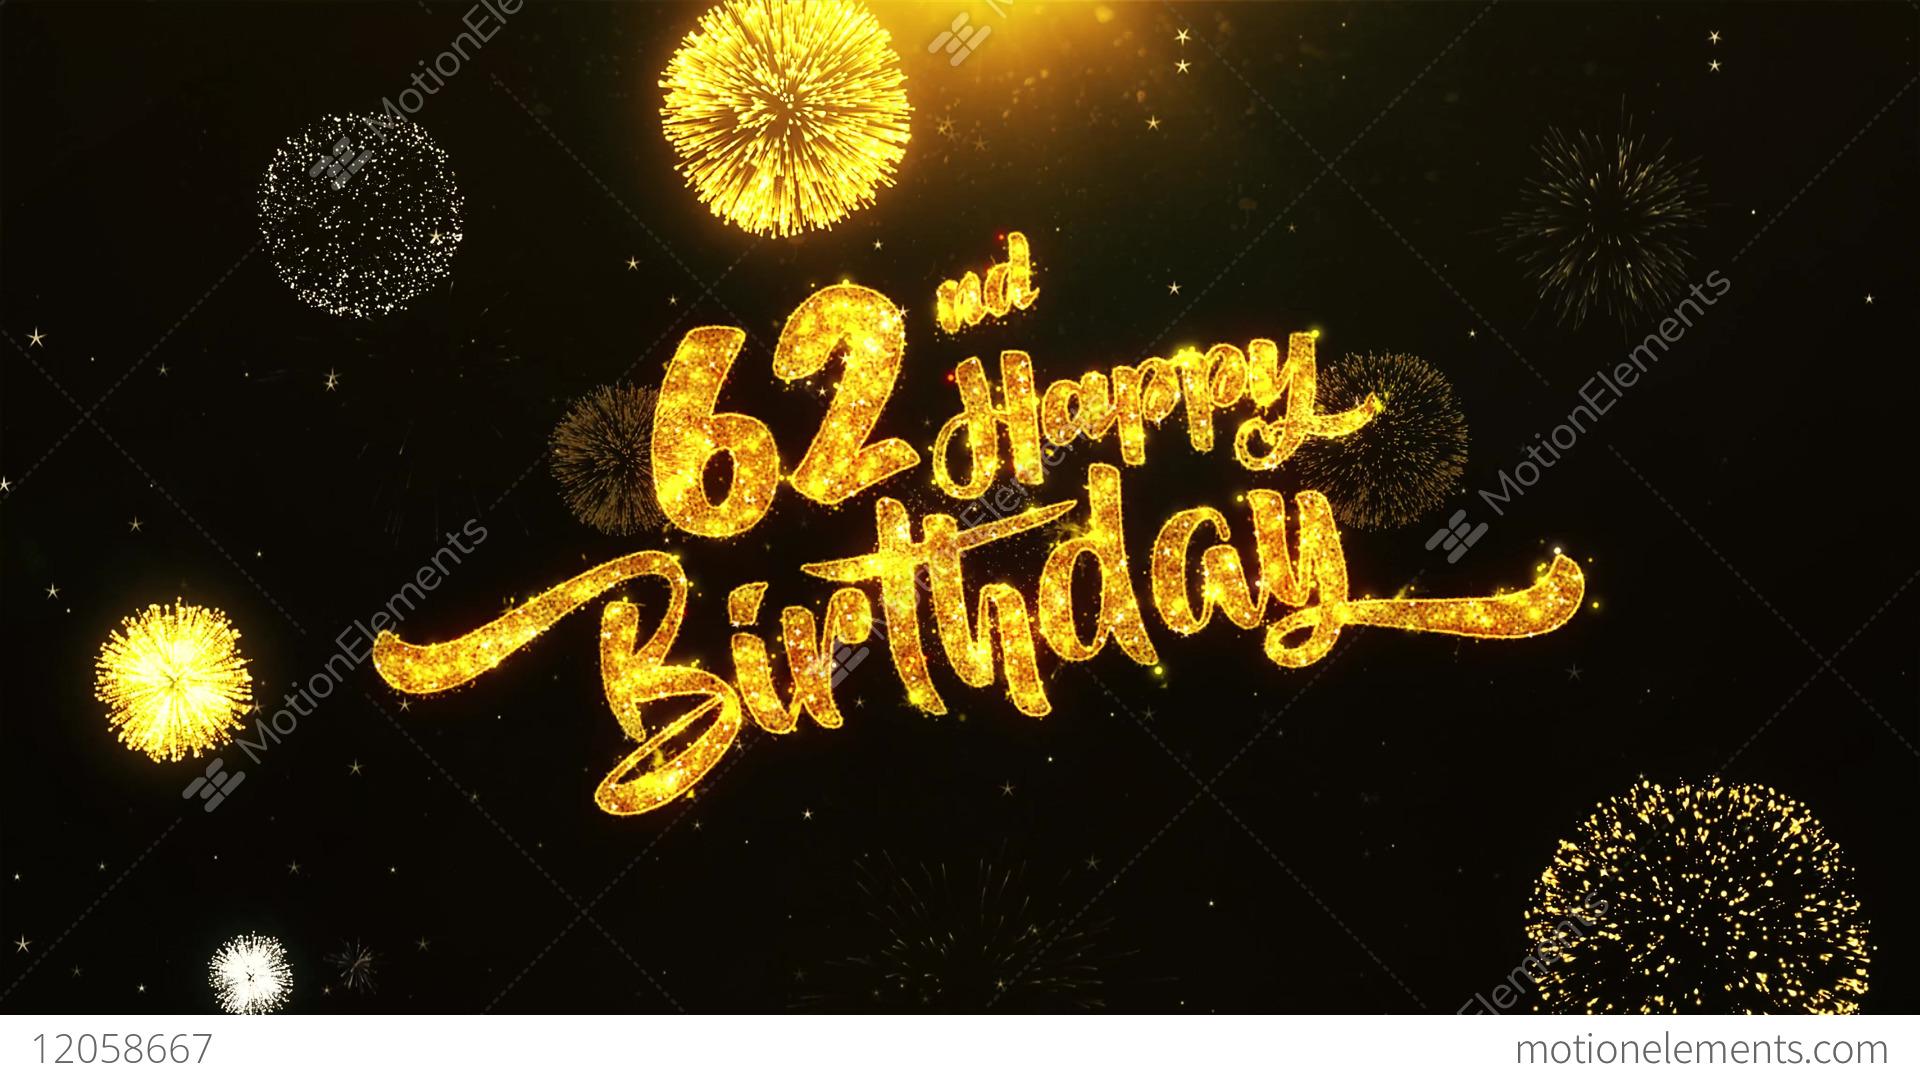 Happy 62nd birthday topsimages happy birthday text greeting wishes celebration stock video footage jpg 1920x1080 happy 62nd birthday m4hsunfo